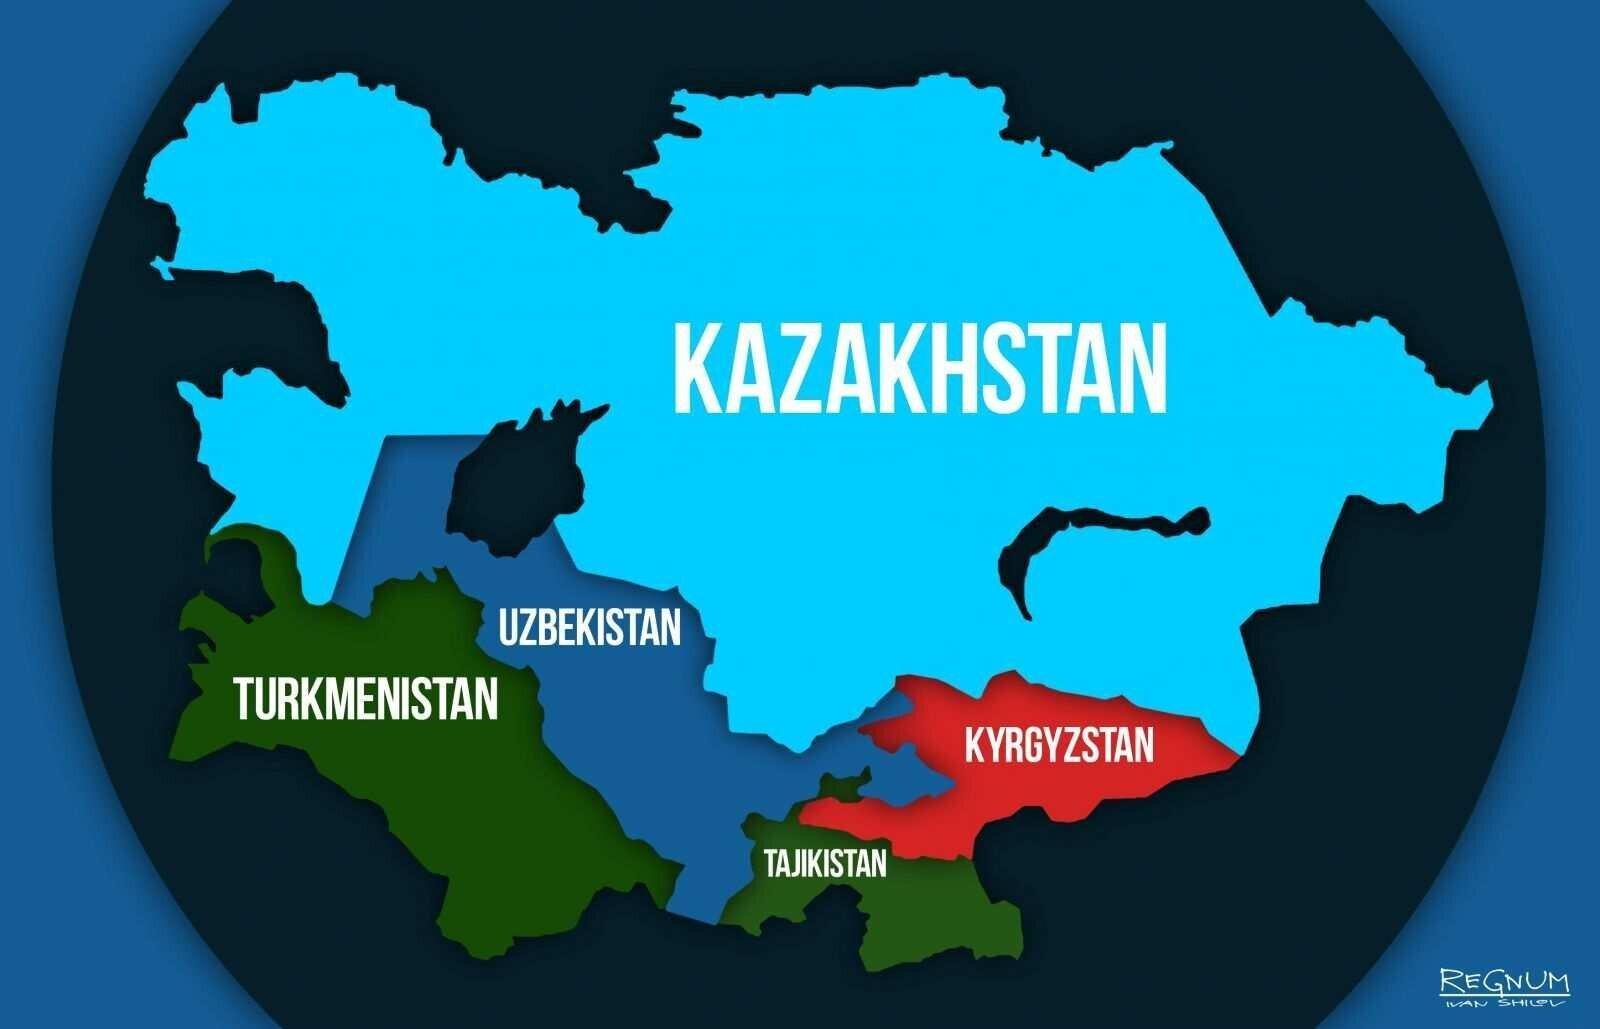 Amidst Pandemic Kazakhstan Already Attracted US$ 3.6 Billion FDI